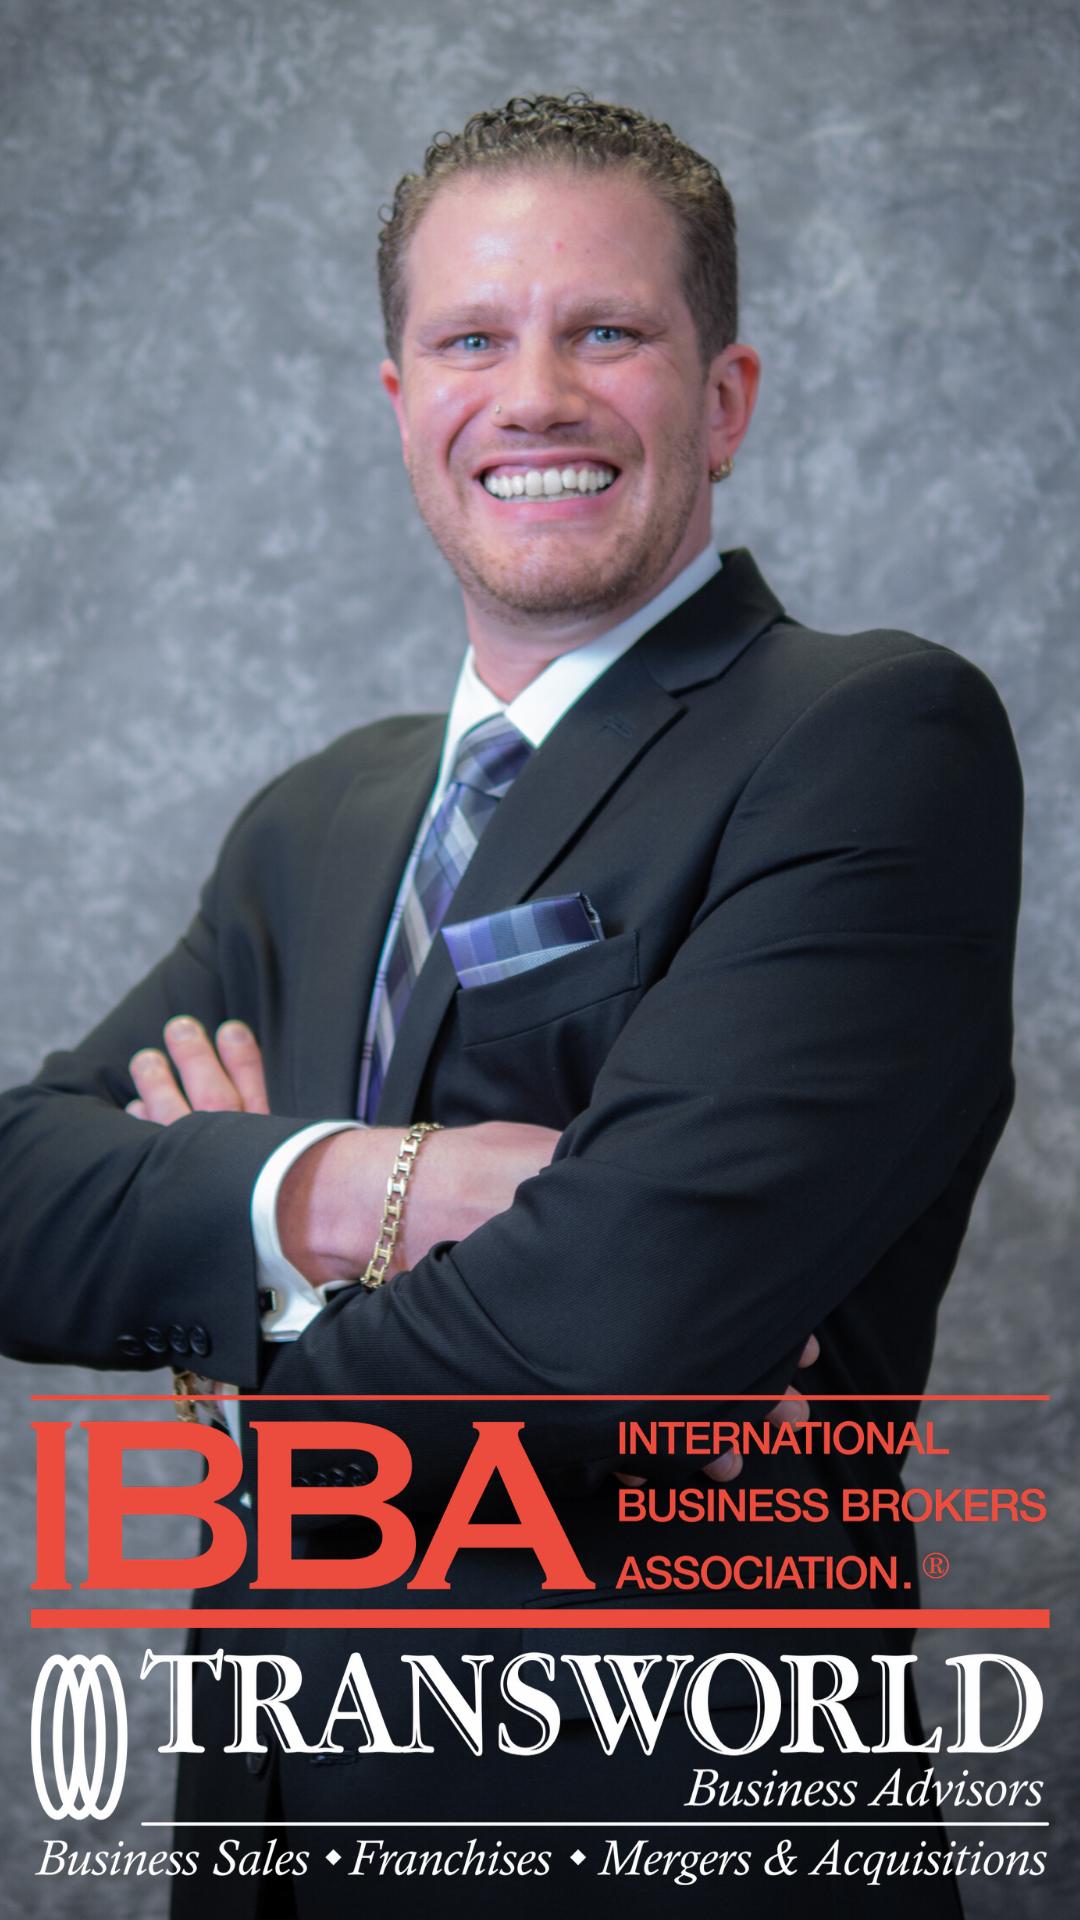 The International Business Brokers Association Recognizes North Carolina Business Broker Joe Santora of Transworld Business Advisors